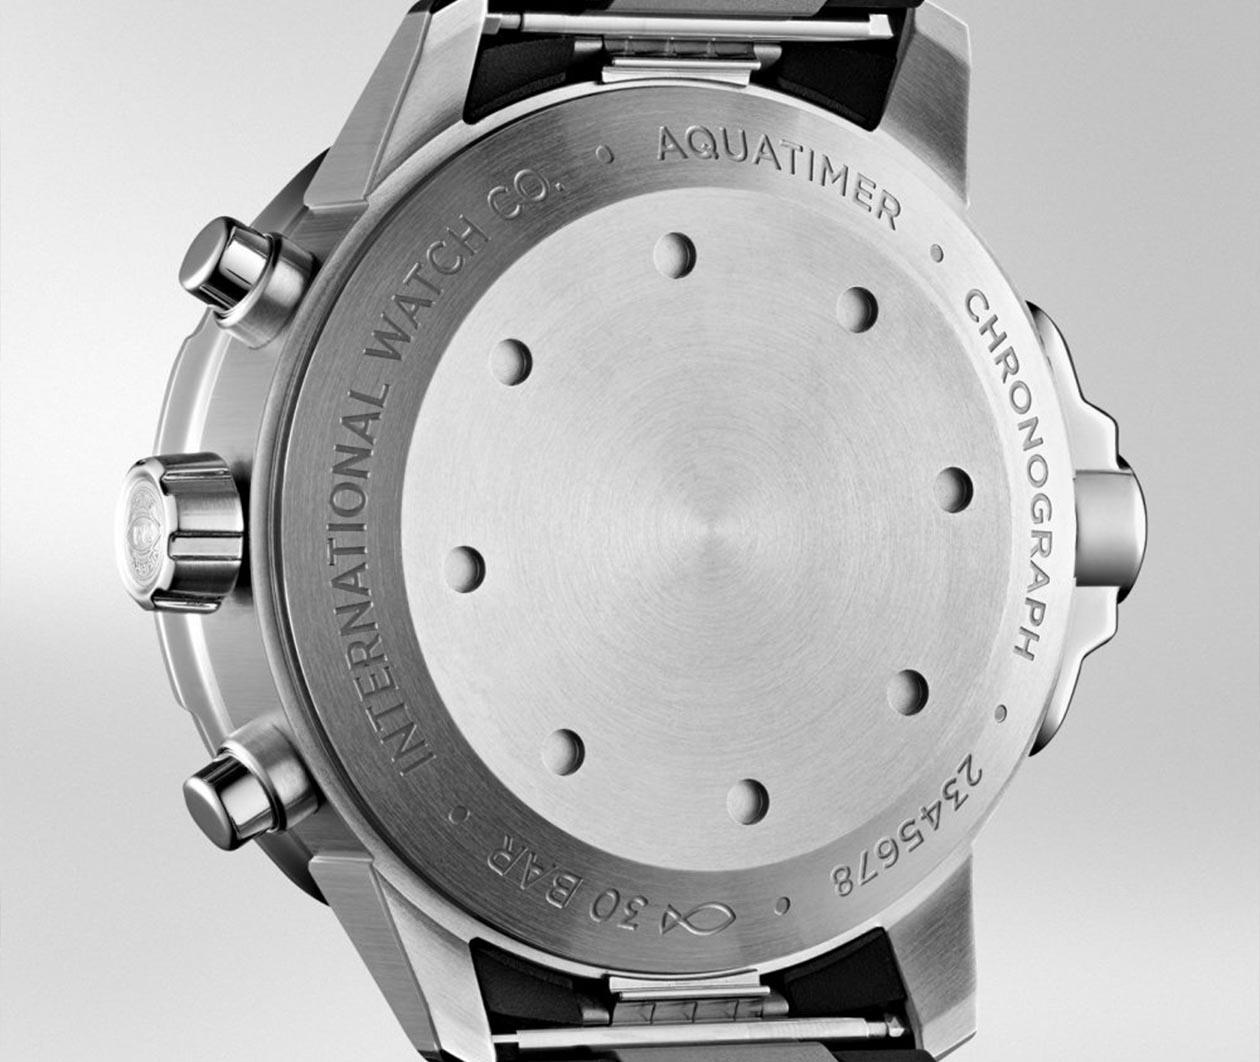 IWC Aquatimer Chronograph IW376803 Carousel 5 FINAL